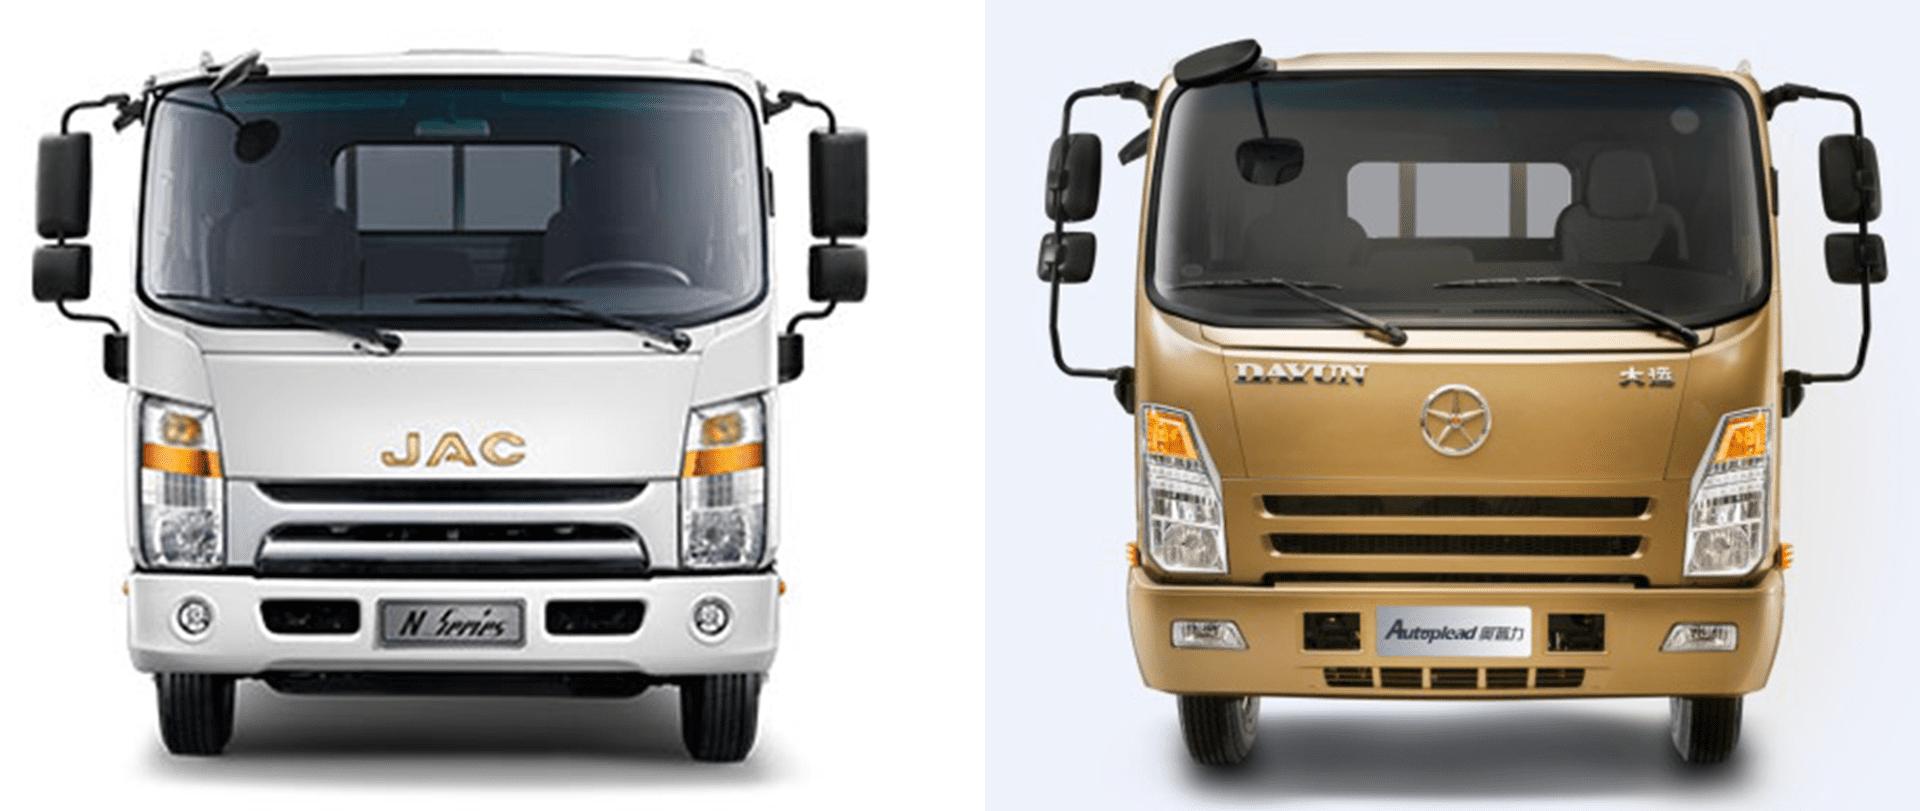 مقایسه 2 کامیونت جک و دایون